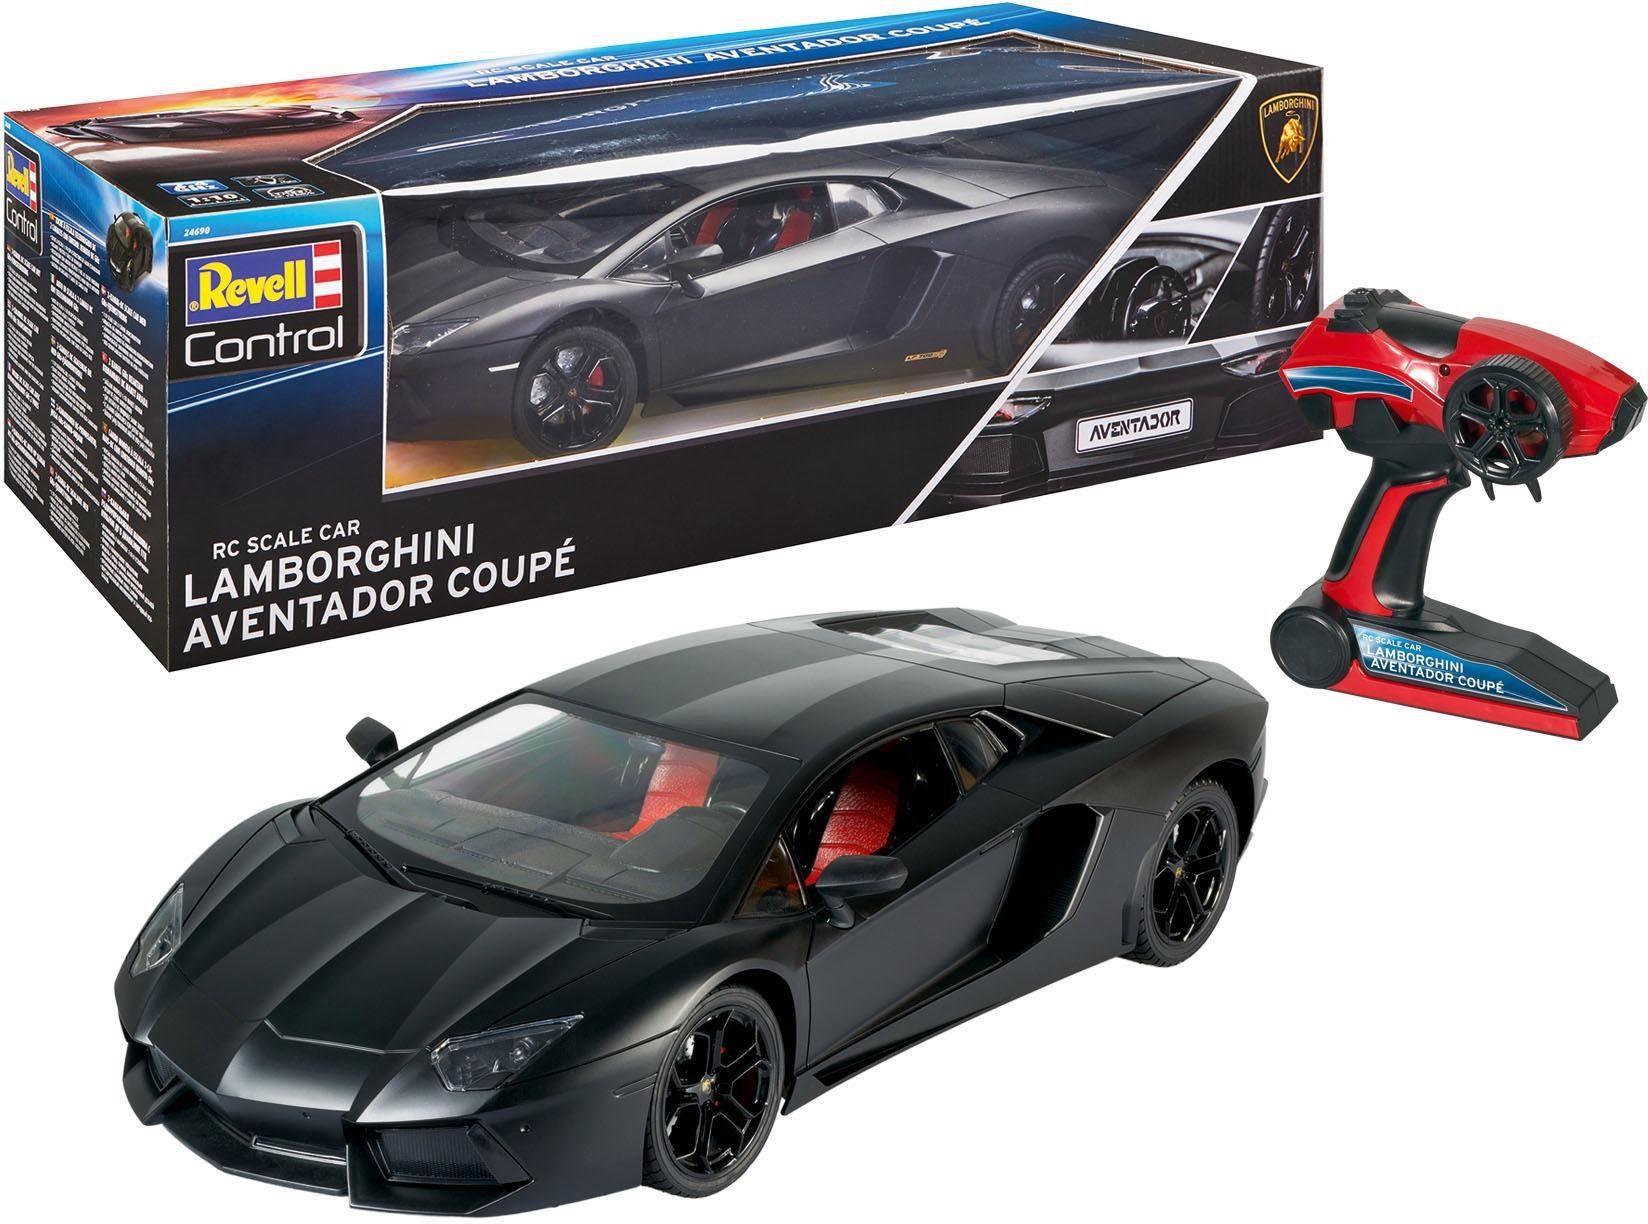 Revell RC Auto, »Revell® control, Lamborghini Aventador Coupé, 2,4 GHz, 1:10«